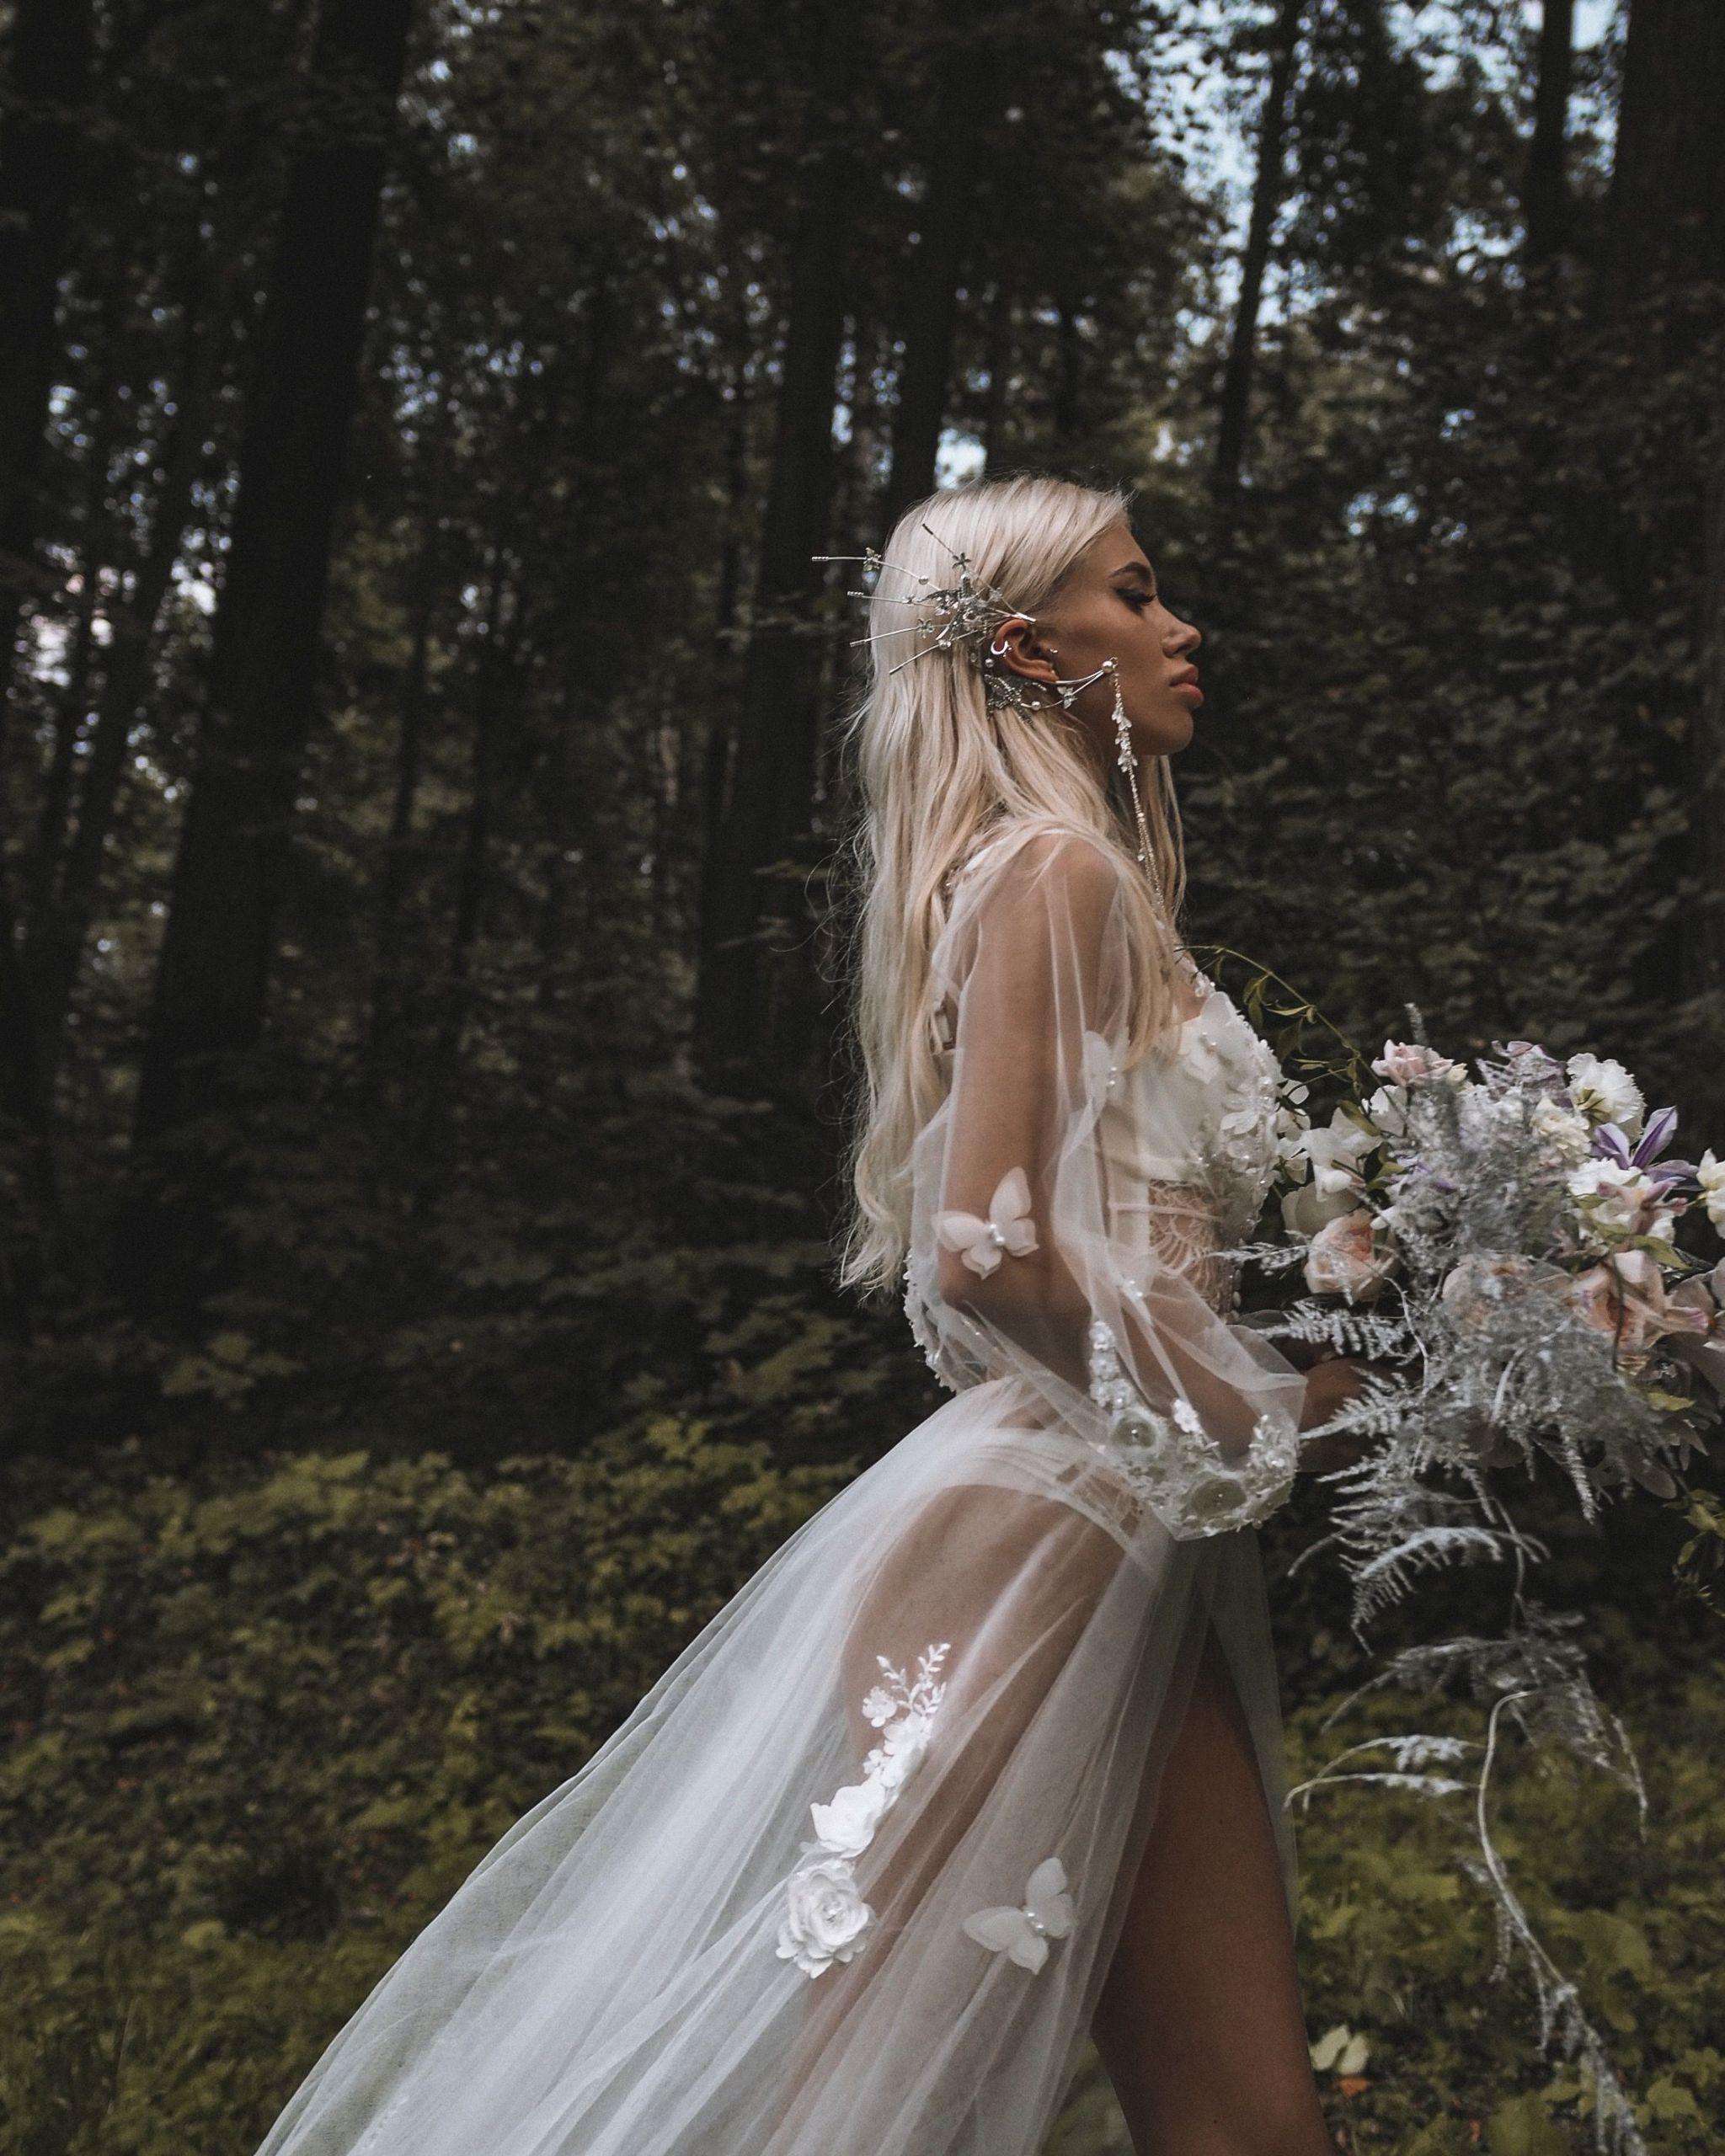 Table Haute Palette Charmant Свадьба мечты Ручшие изображения 34 в 2019 г